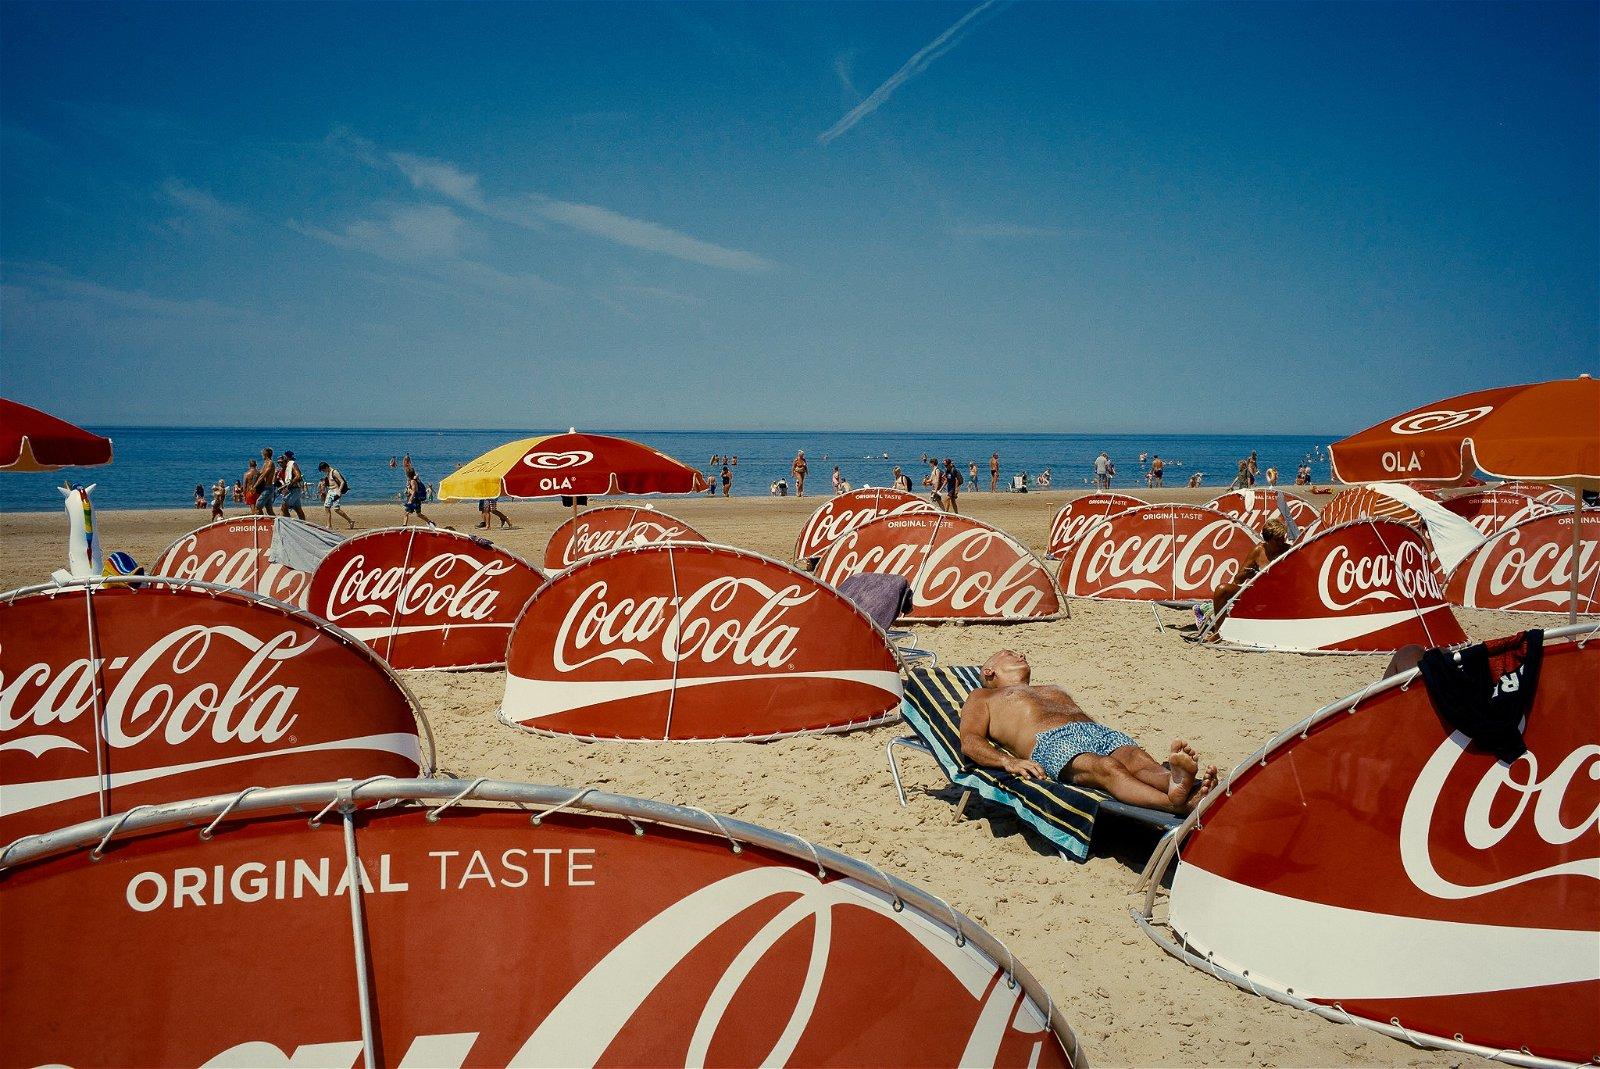 Beach Coca Cola by André Duhme